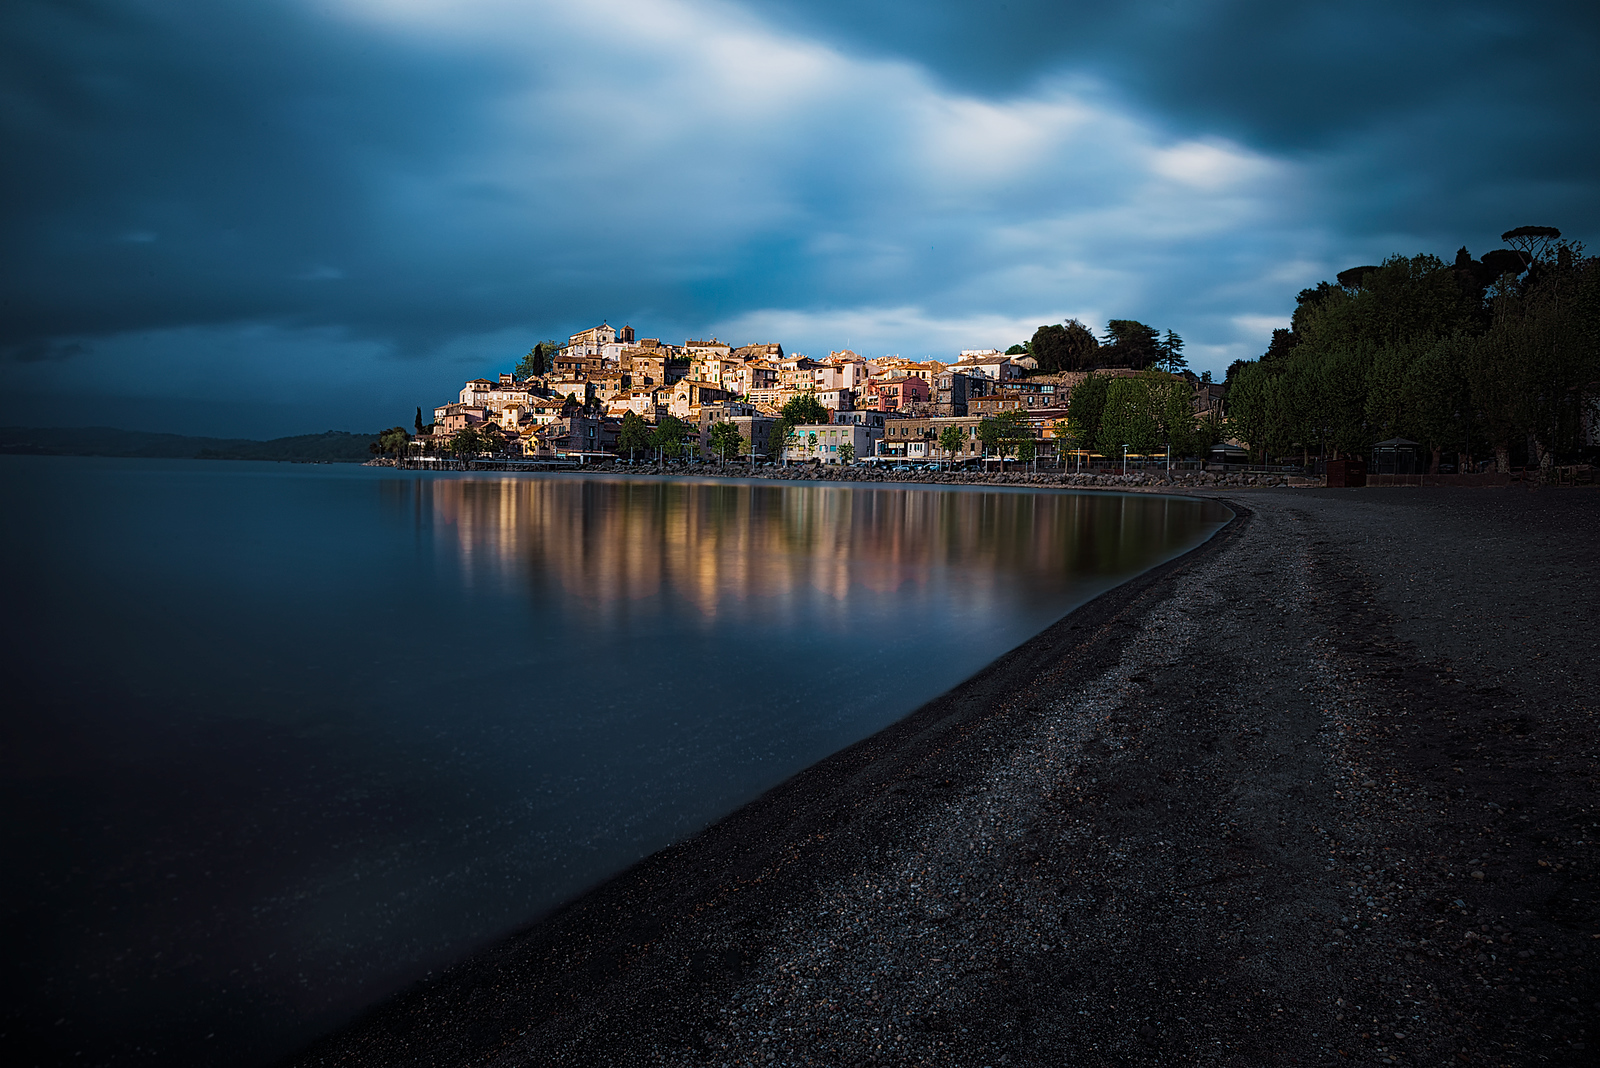 Anguillara Sabazia, Lazio, Italy